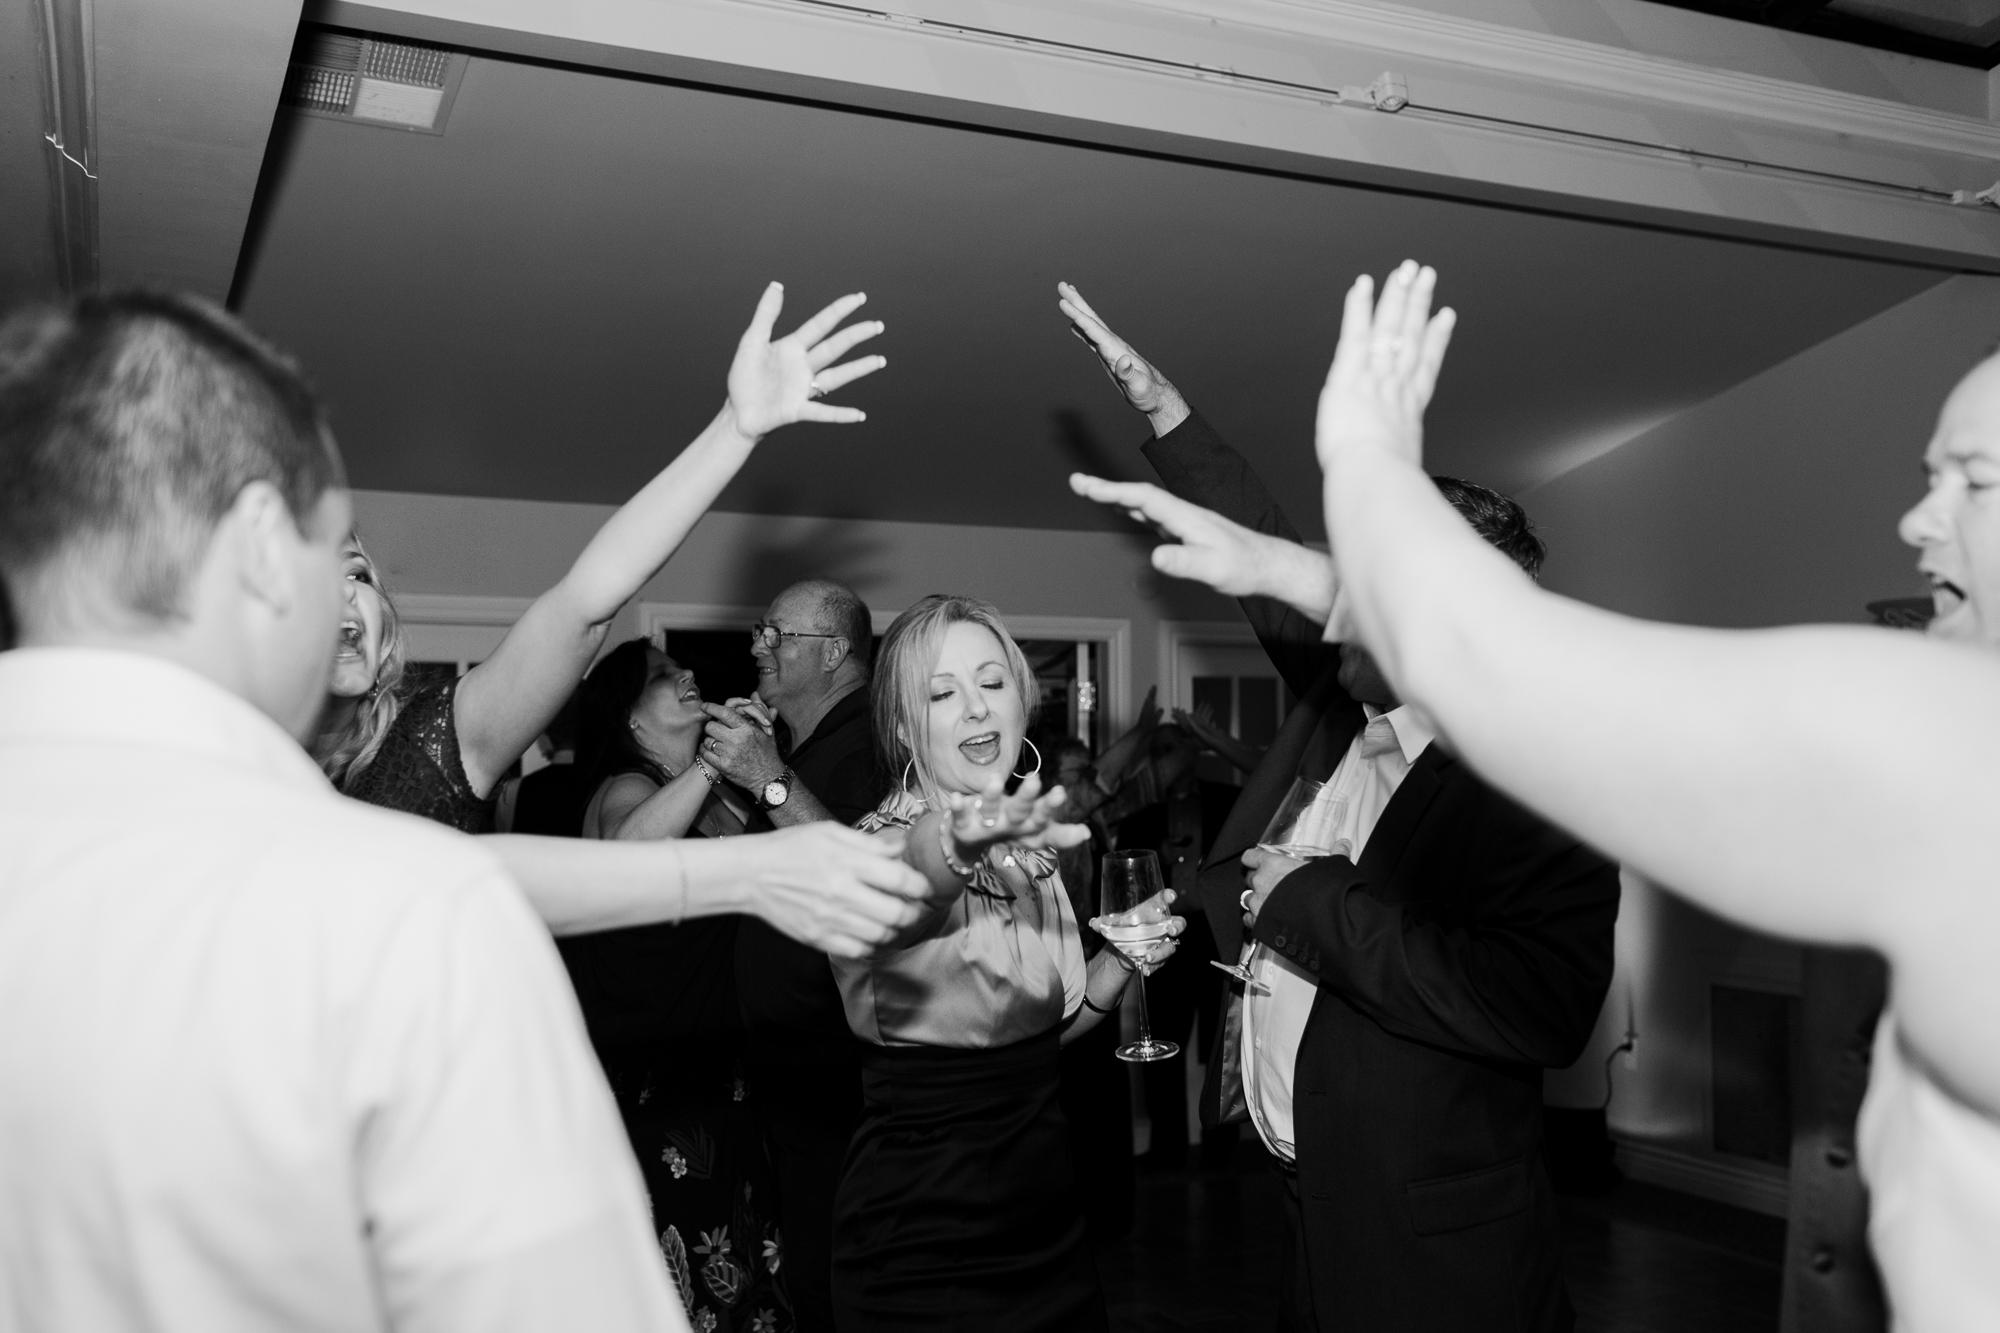 marin art and garden center wedding, magc wedding, marin wedding, marin art and garden center wedding photographer, marin wedding photographer, maria villano photography, ross wedding, ross wedding photographer, marin wedding